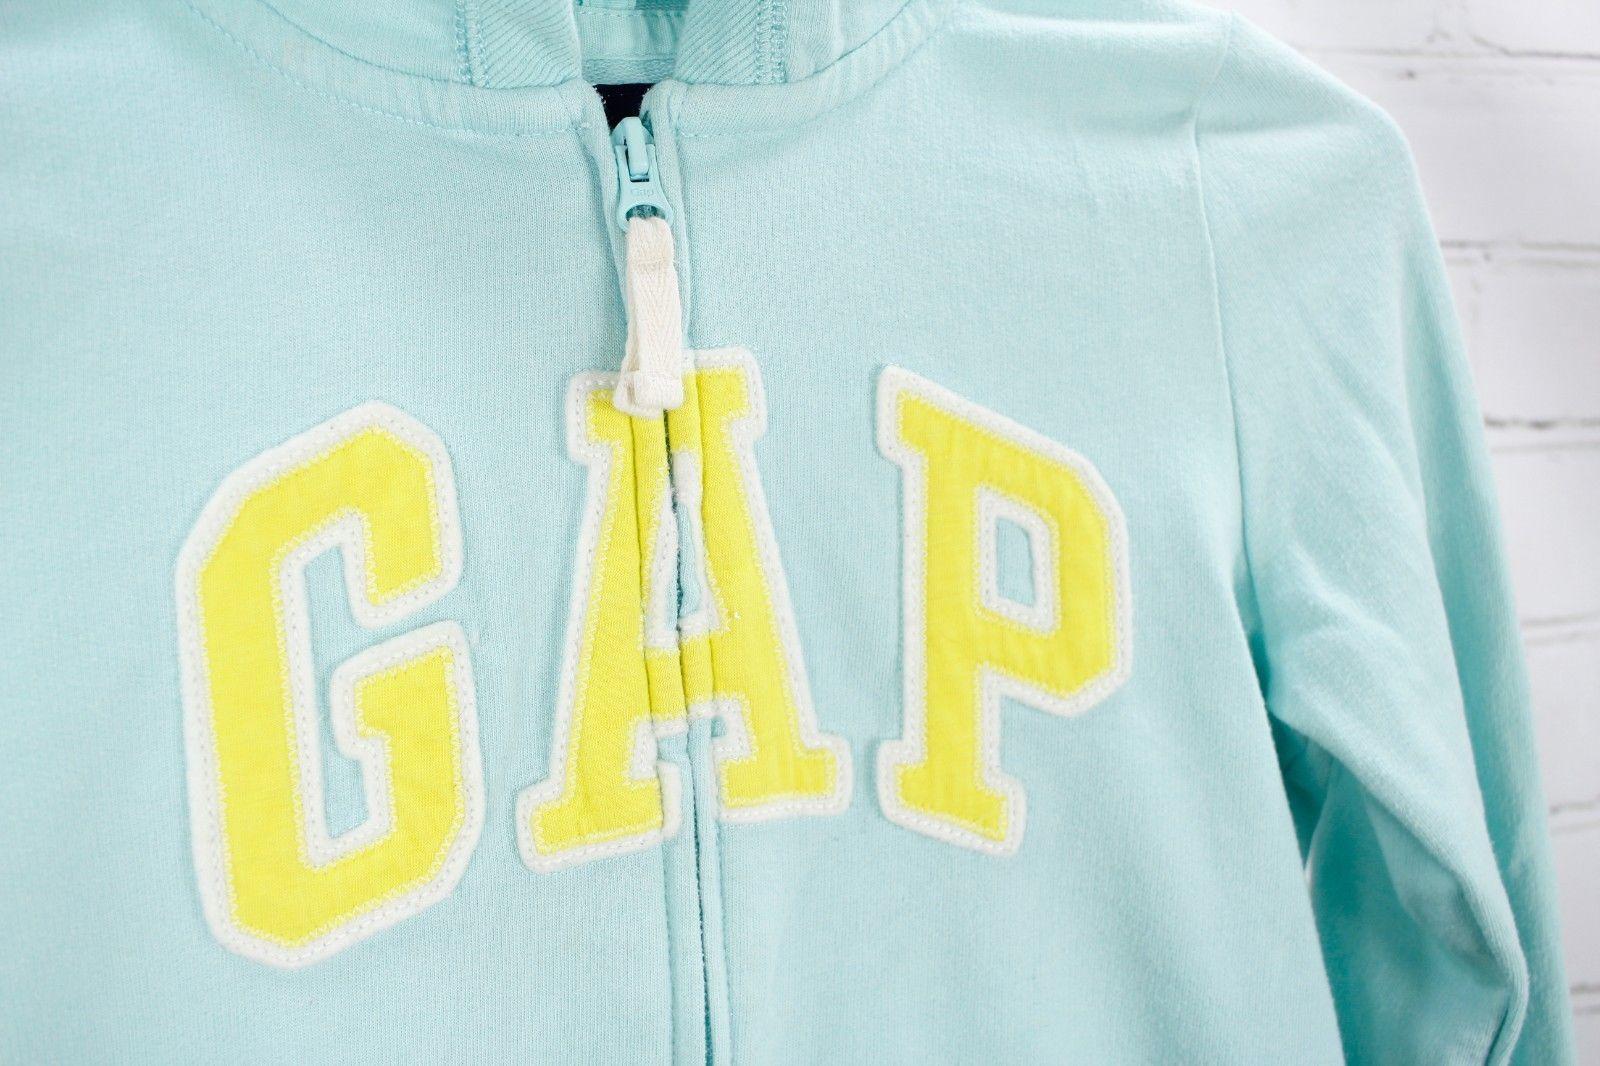 Gap Kids Logo Full Zip Hoodie Sweatshirt + Jeans Girls Size L 10 Outfit Set  image 4